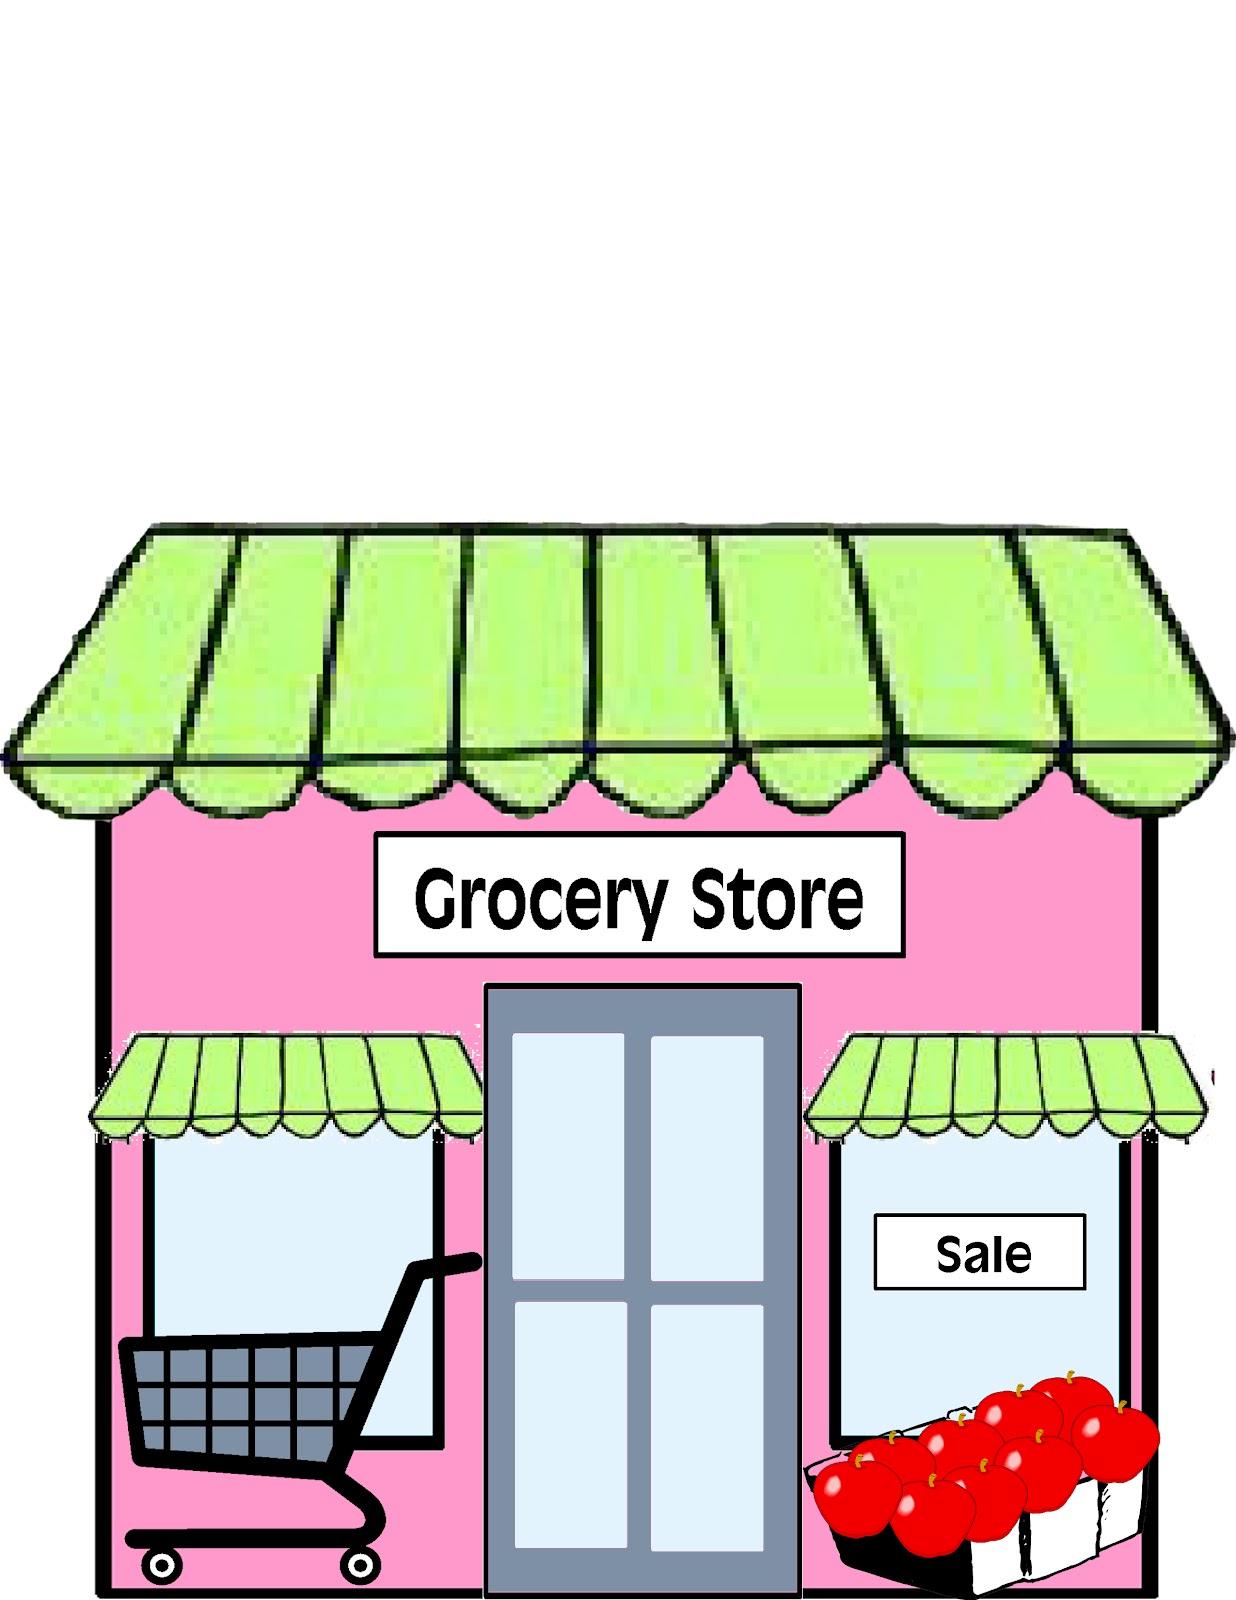 Clipart restaurant grocery store building. Supermarket free jpg clipartpost